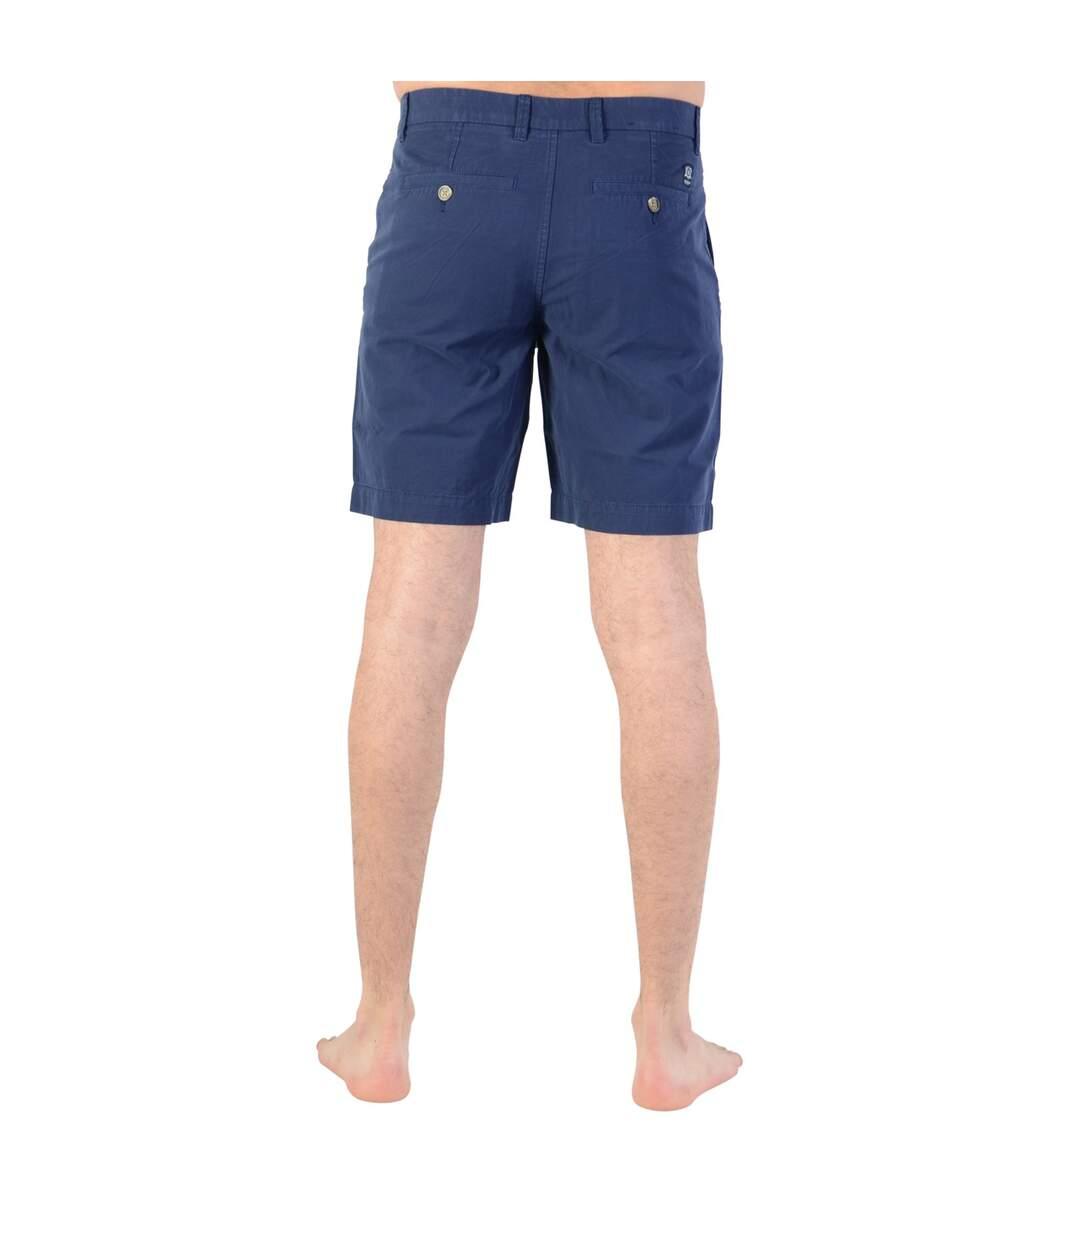 Short Mc Gregor Ryan Grover SF Basic Sportwear Del.3 Navy